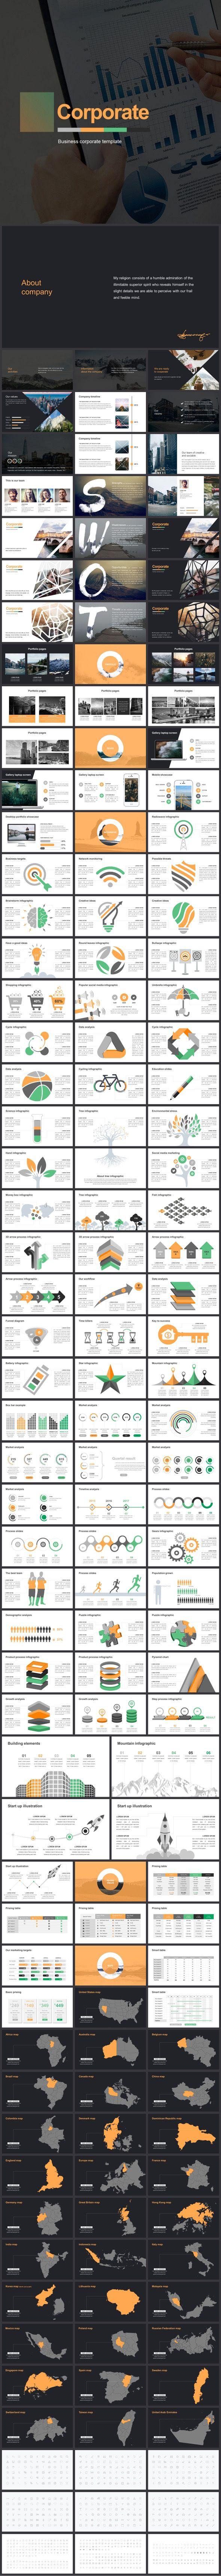 Corporate Business Google Slides Template — Google Slides PPTX #dreams #value proposition • Download ➝ https://graphicriver.net/item/corporate-business-google-slides-template/19196441?ref=pxcr